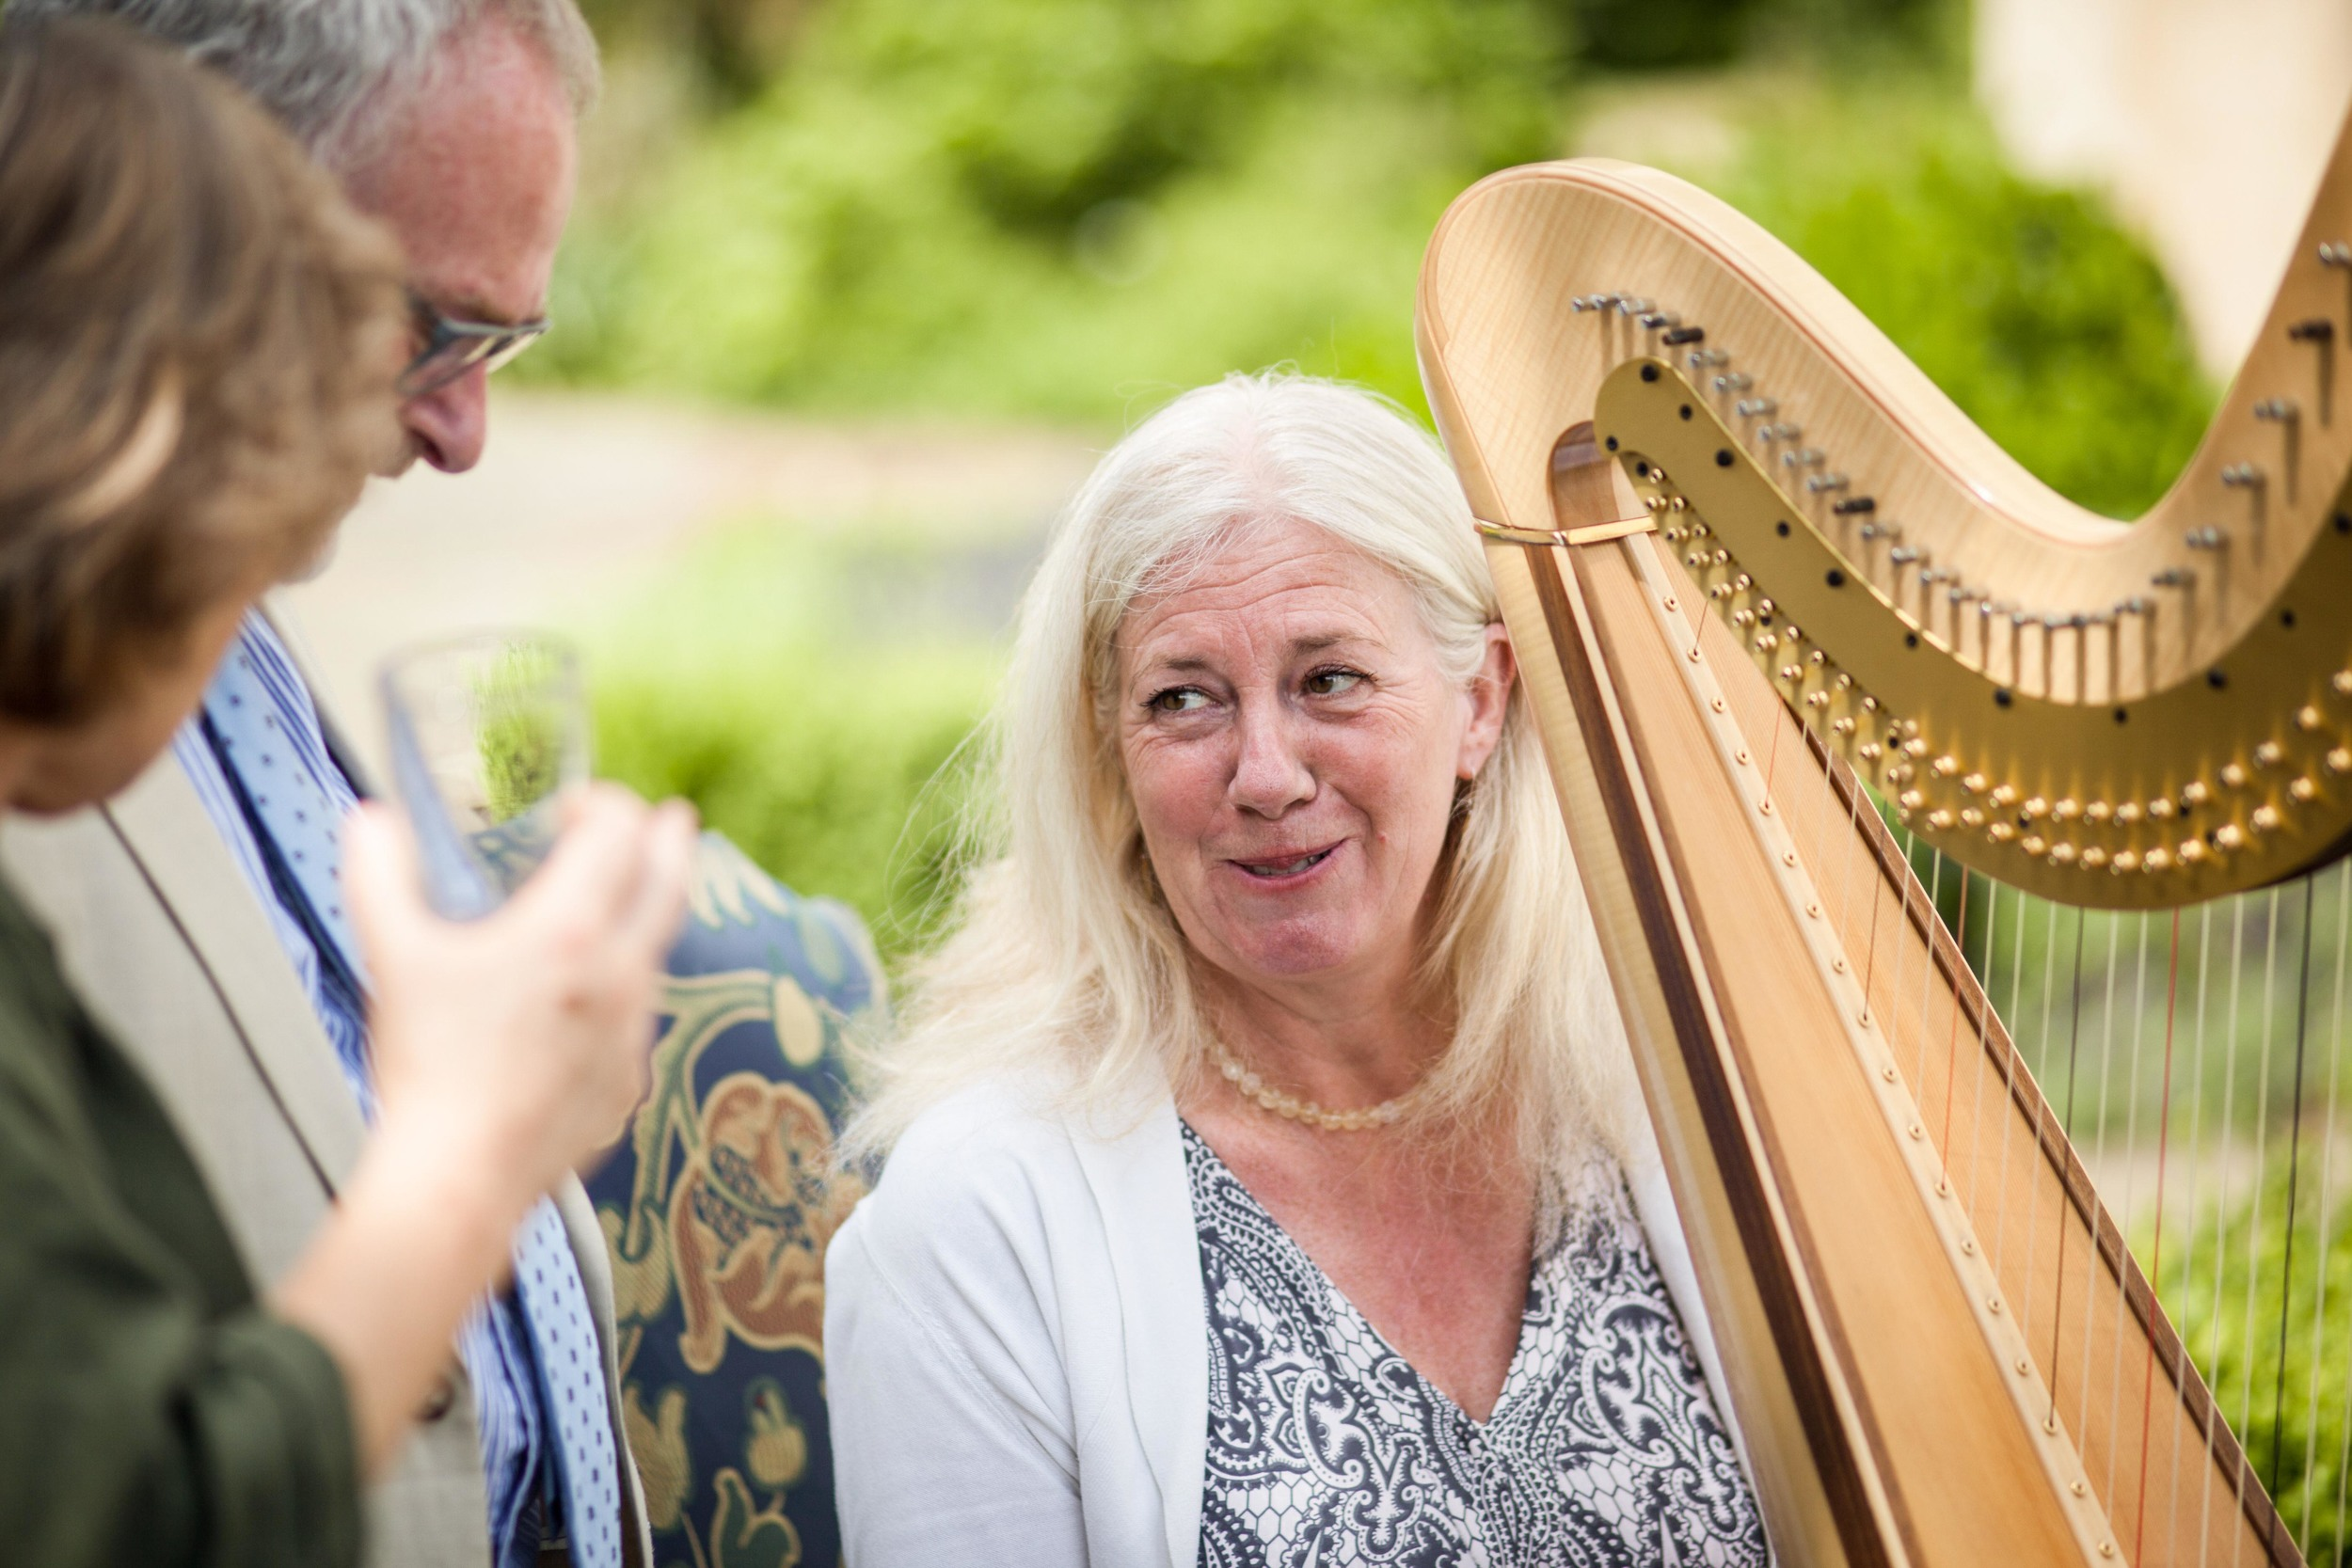 022  - Xenia Horne UK Harpist by Mark Pugh www.markpugh.com -6.JPG